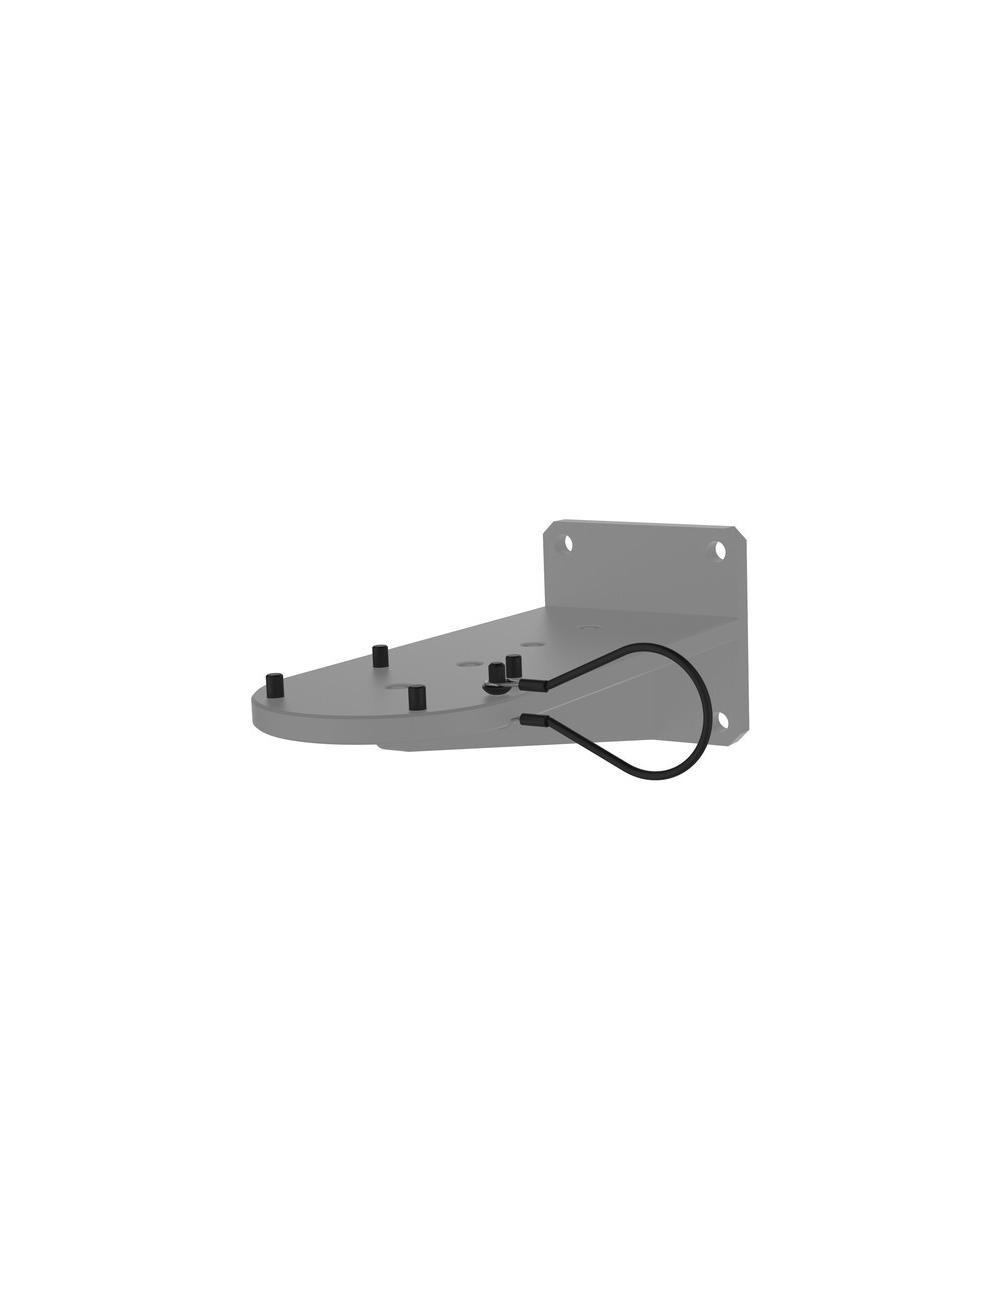 Vantage wall mounting bracket